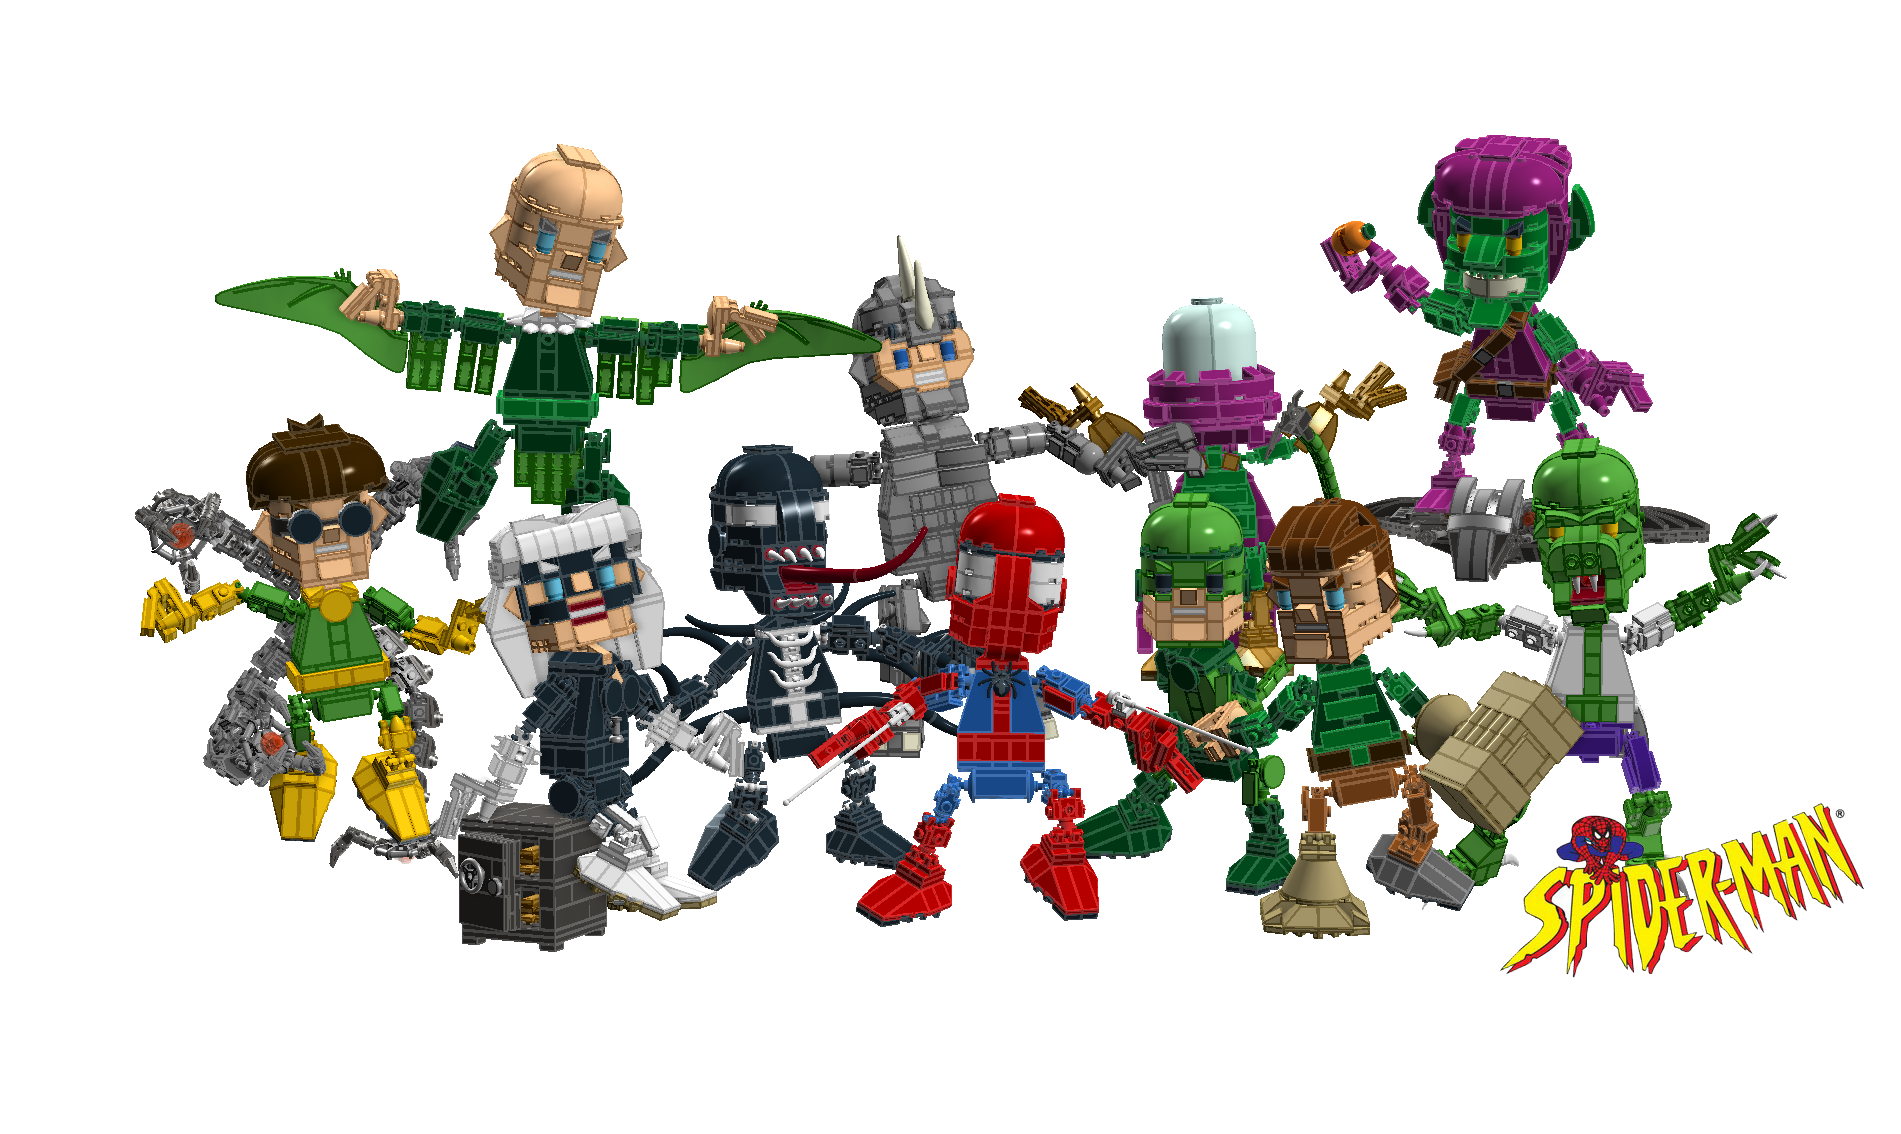 Marvel comics spiderman lego cuusoo project